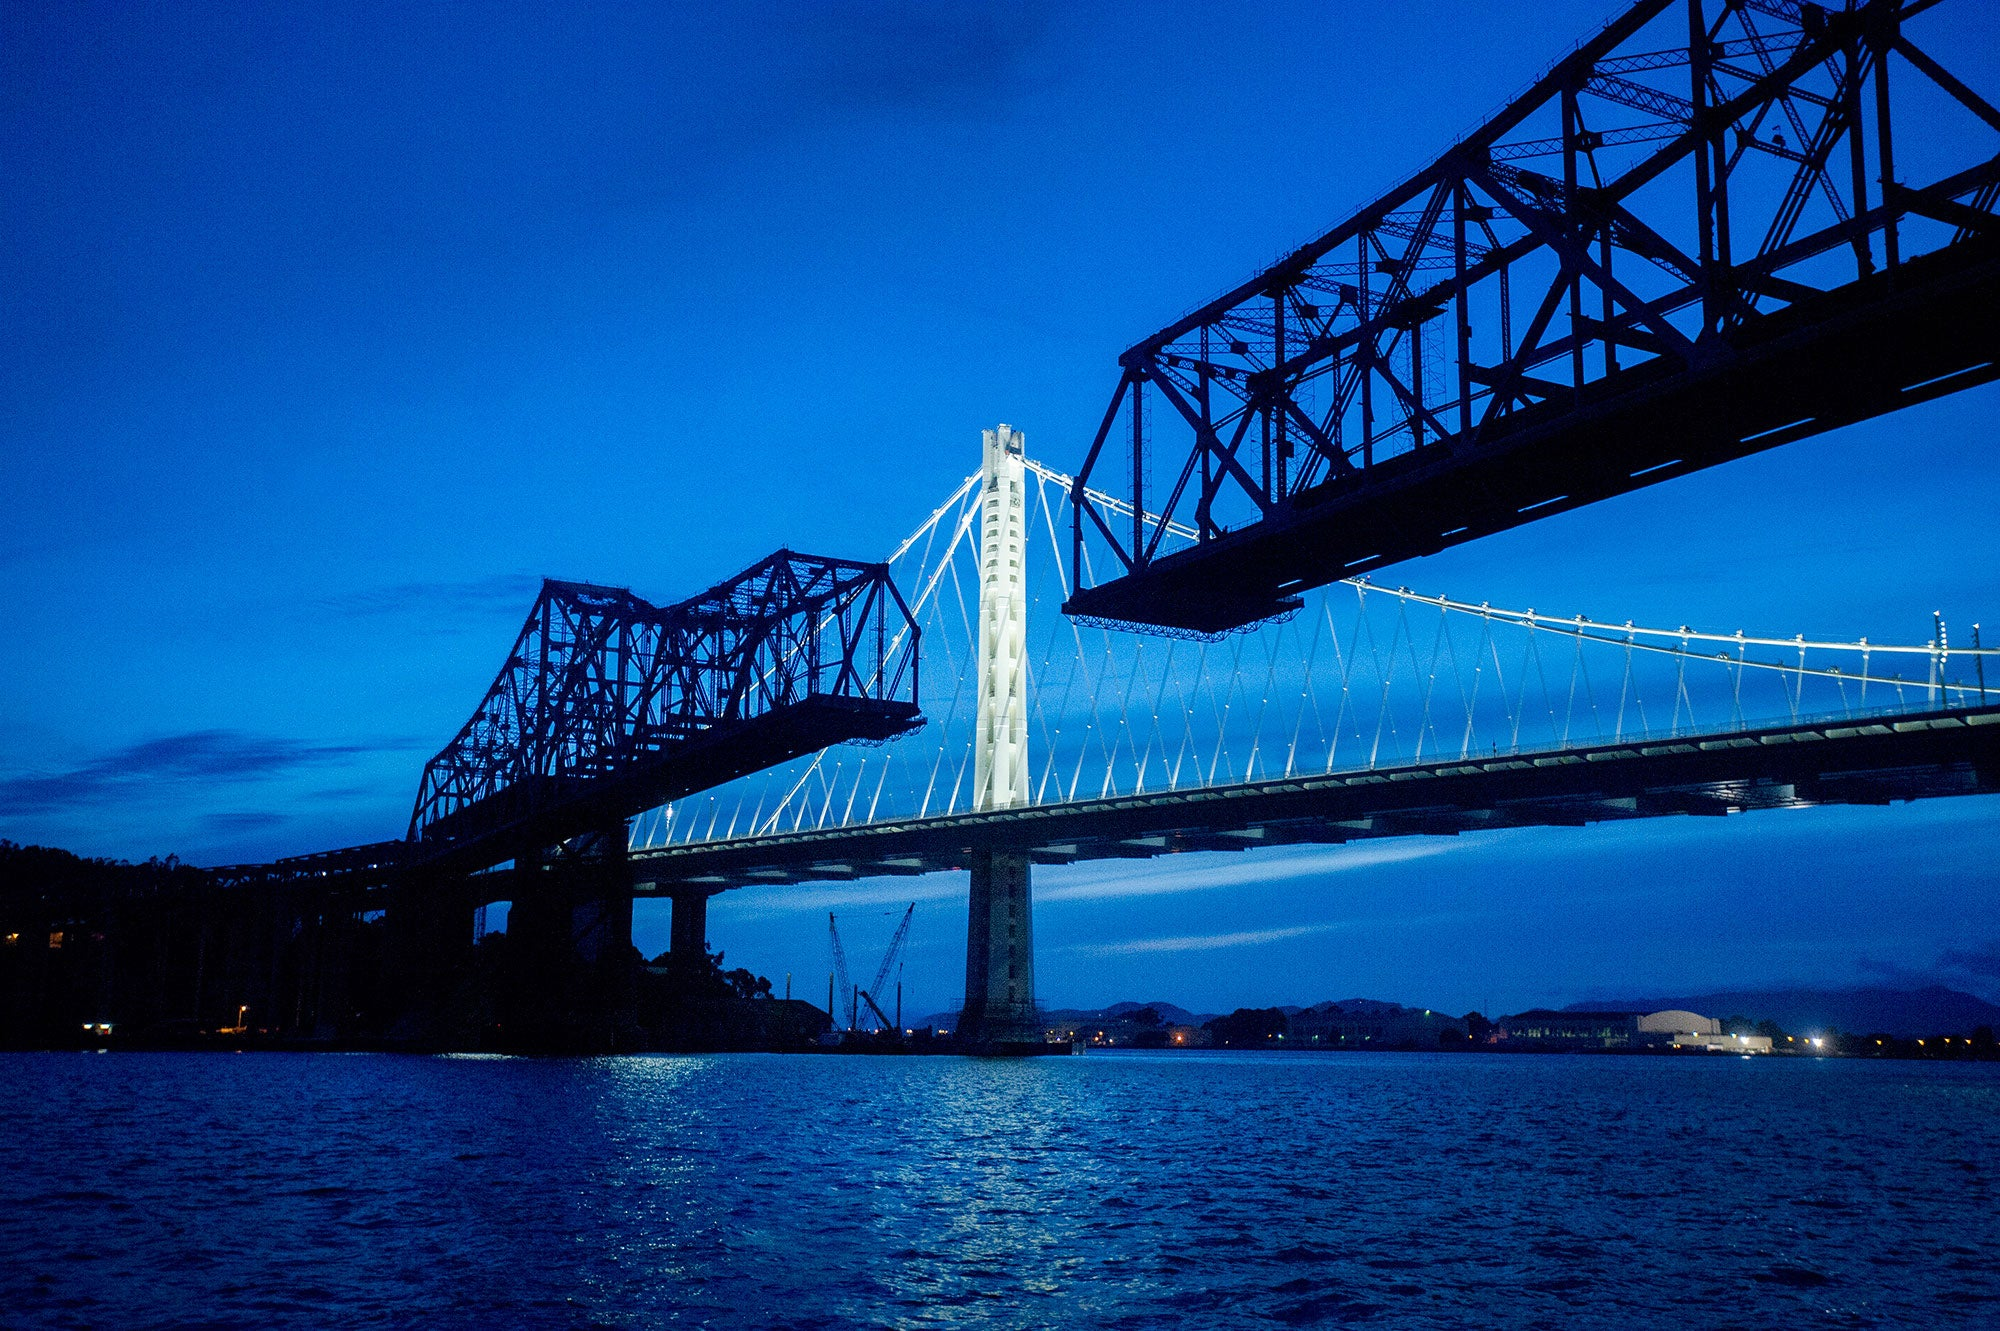 Oakland bay bridge pictures Measure DD - Oakland - Waterfront Action